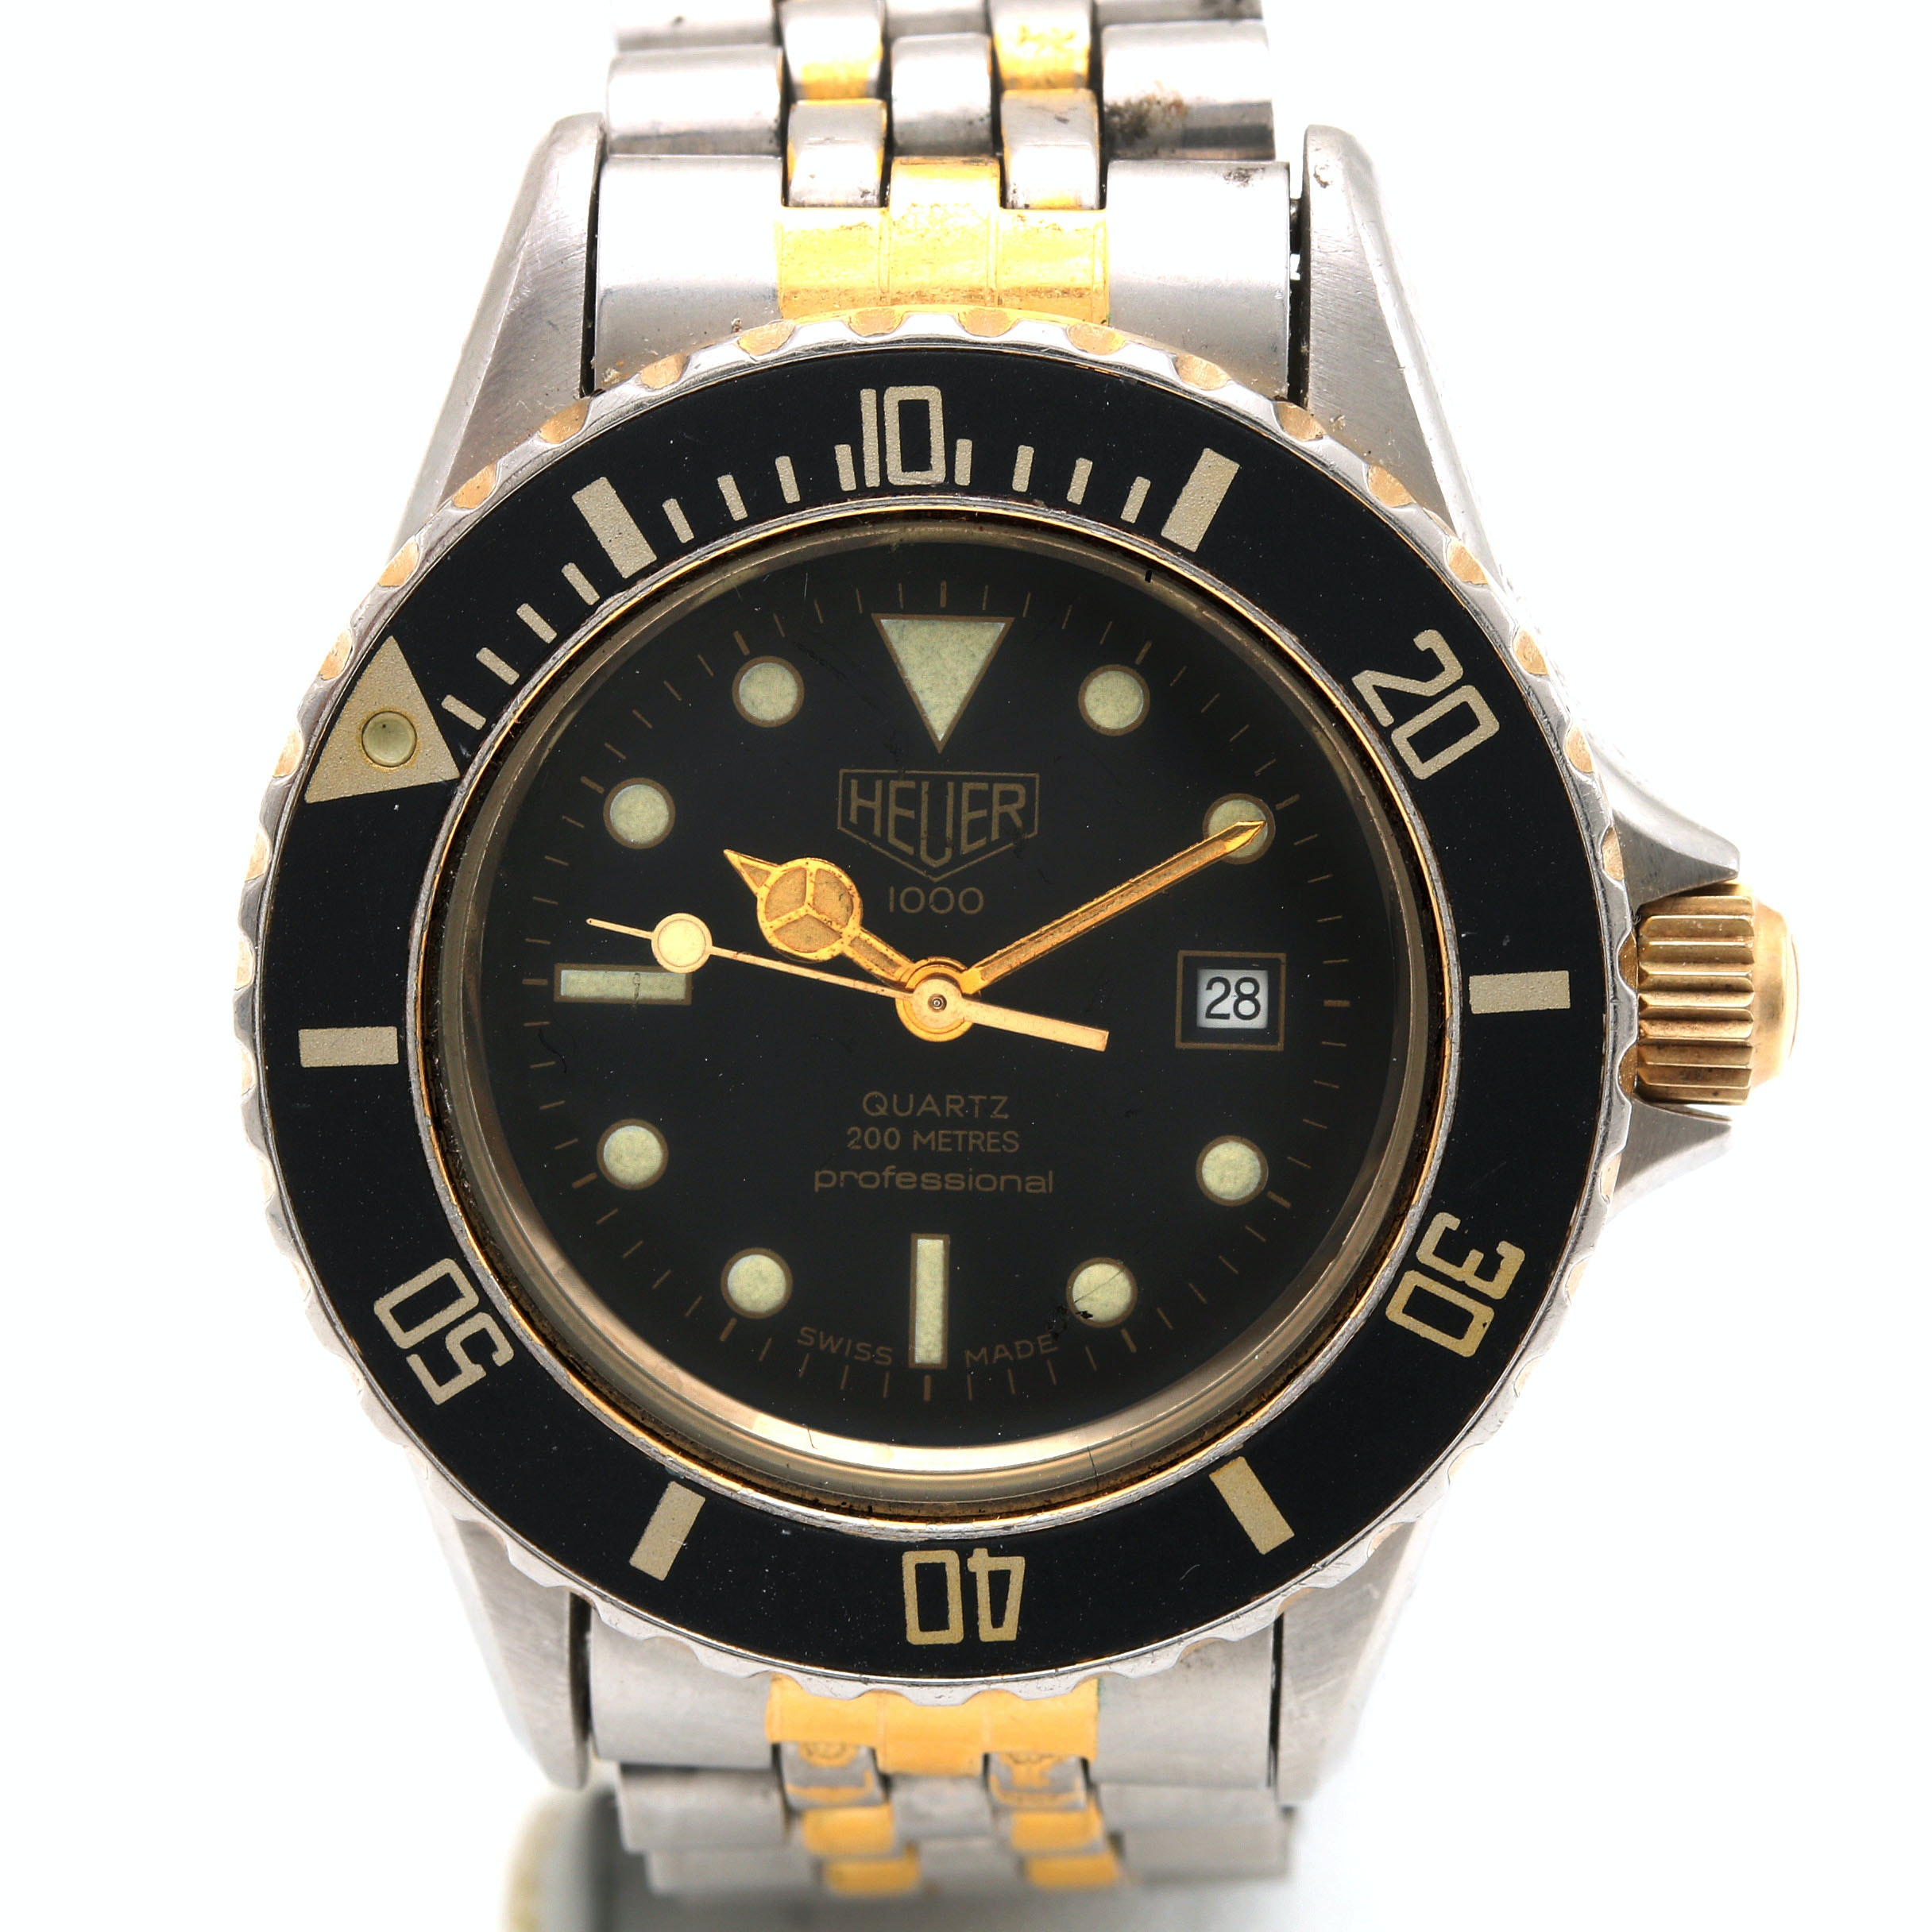 Heuer Stainless Steel Two-Tone Wristwatch